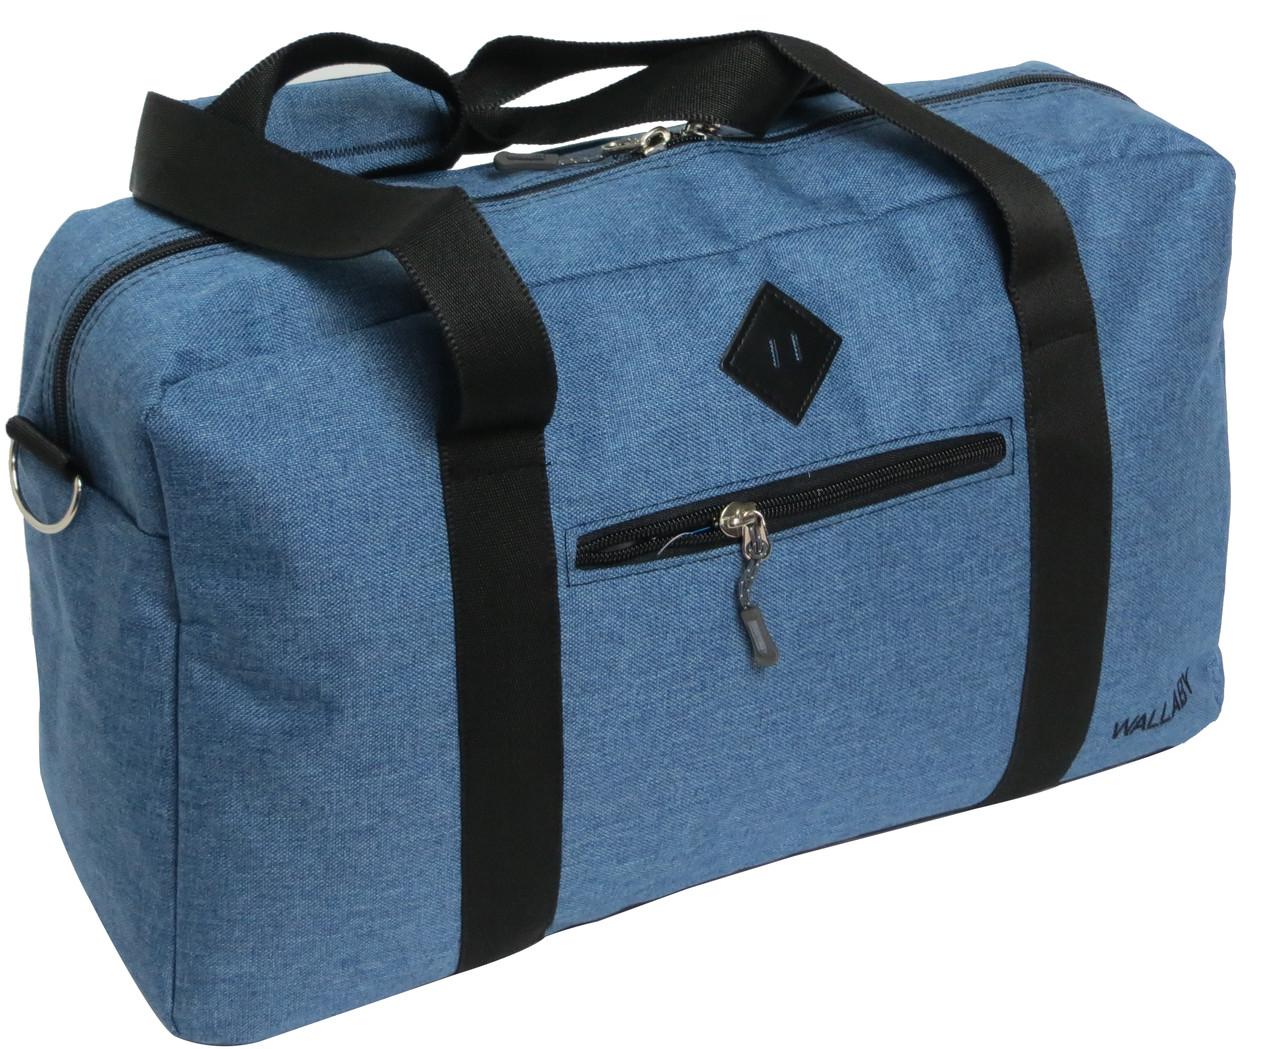 Сумка дорожная Wallaby, 2550 blue, 21 л, синяя